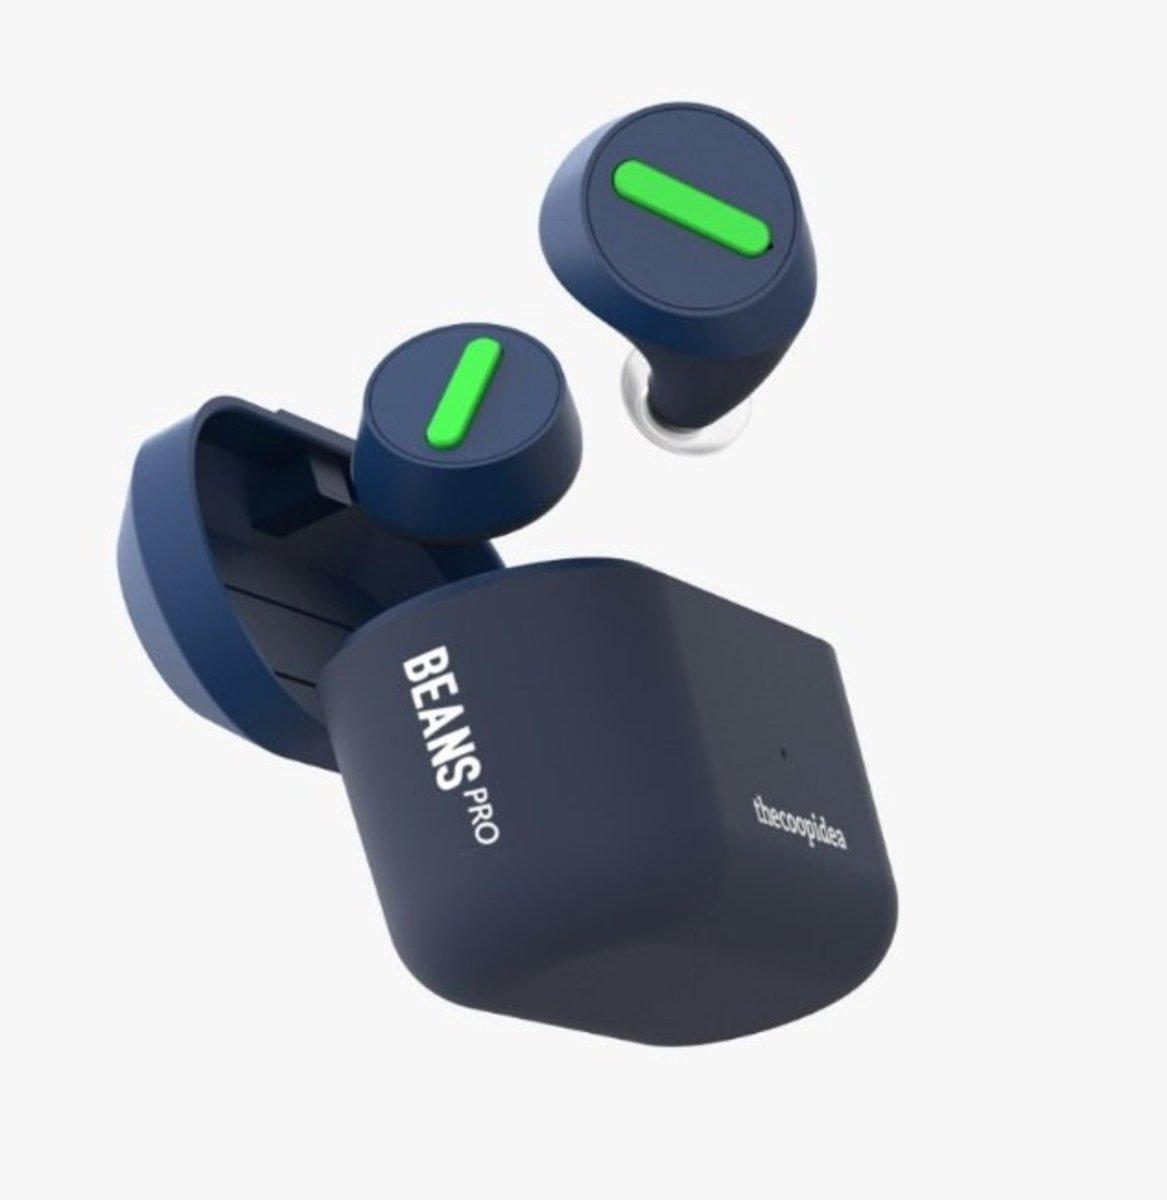 Beans Pro 真無線藍牙5.0防水耳機[藍色]